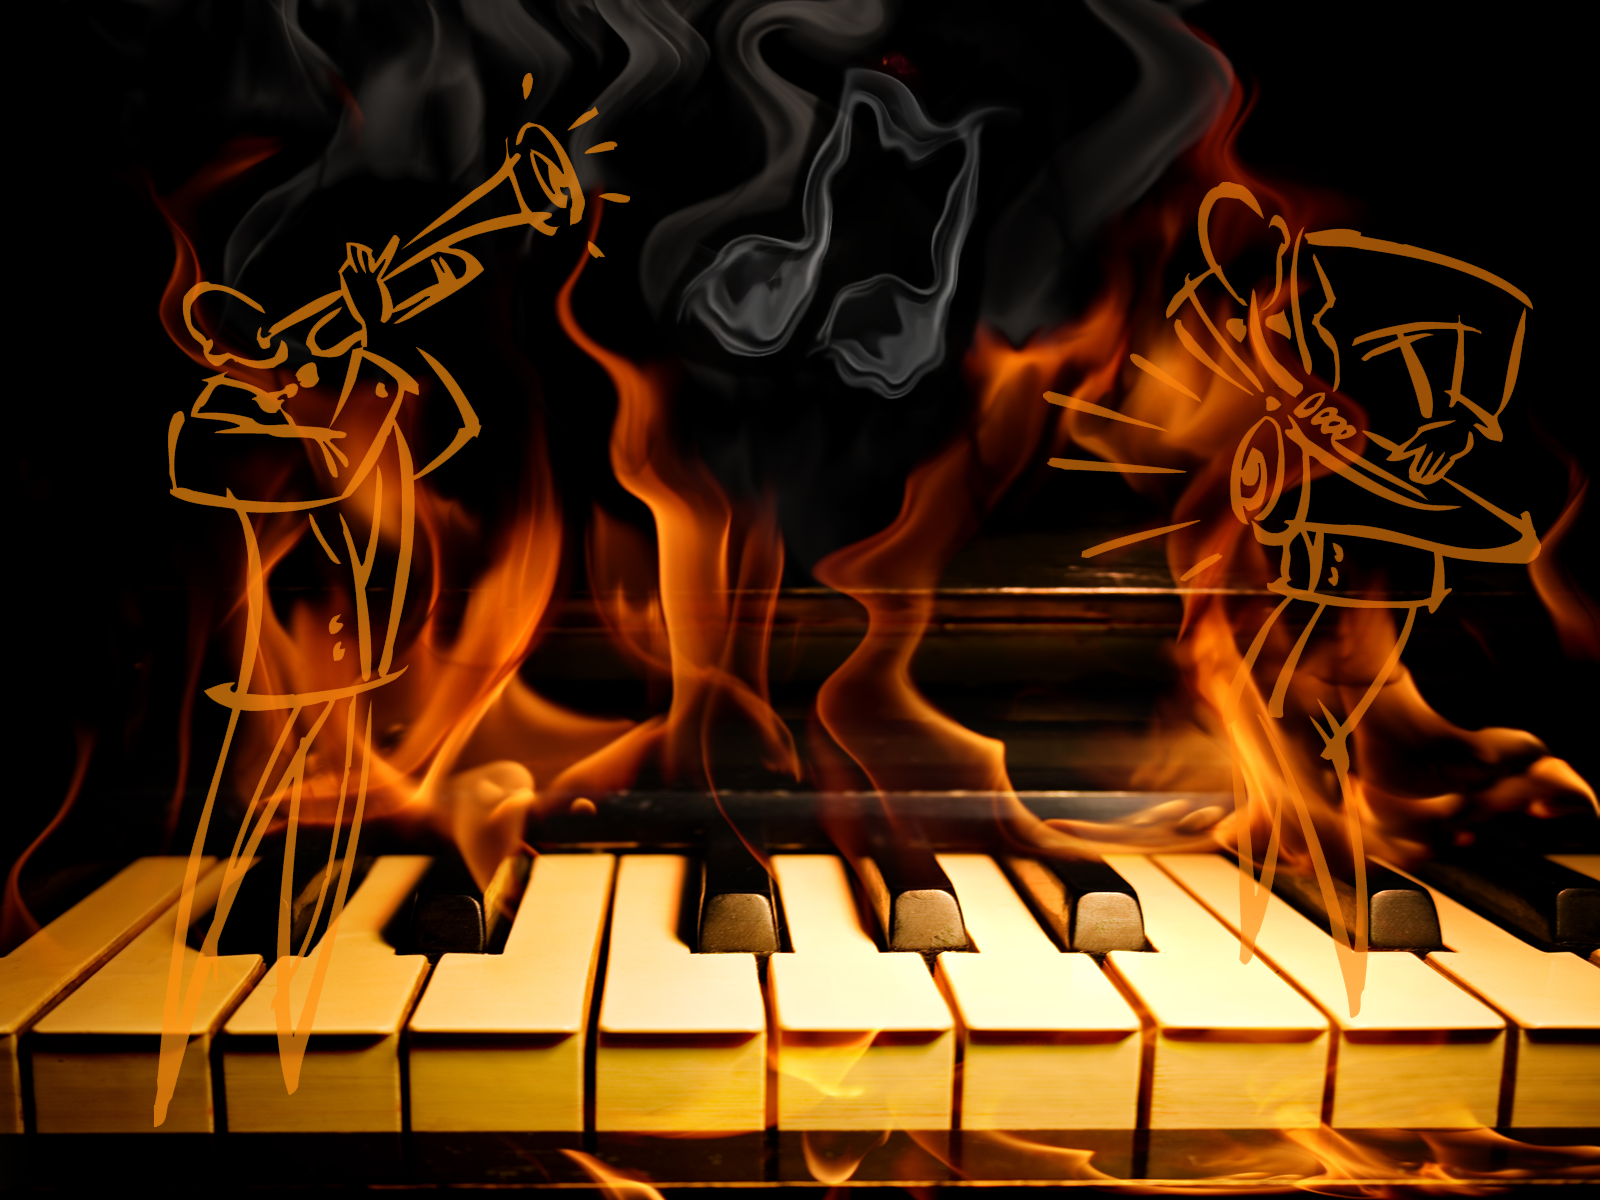 Download Hot Jazz wallpaper The Long Goodbye [1600x1200] 74 1600x1200